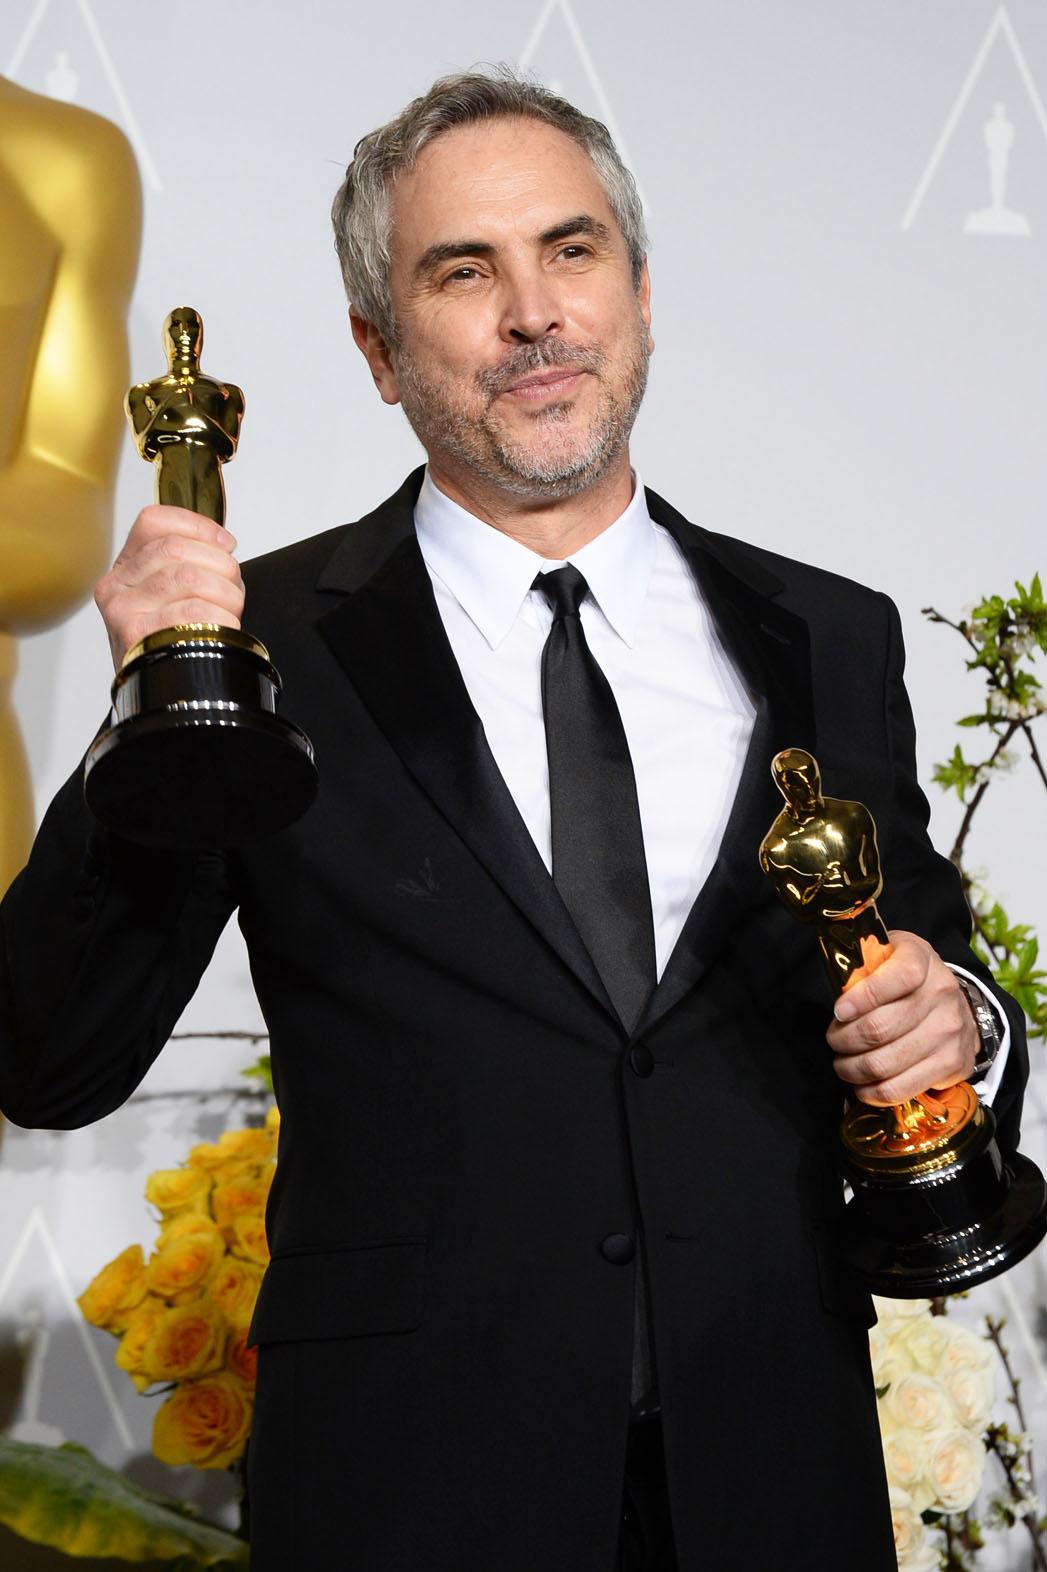 Oscars Alfonso Cuaron with Awards - P 2014